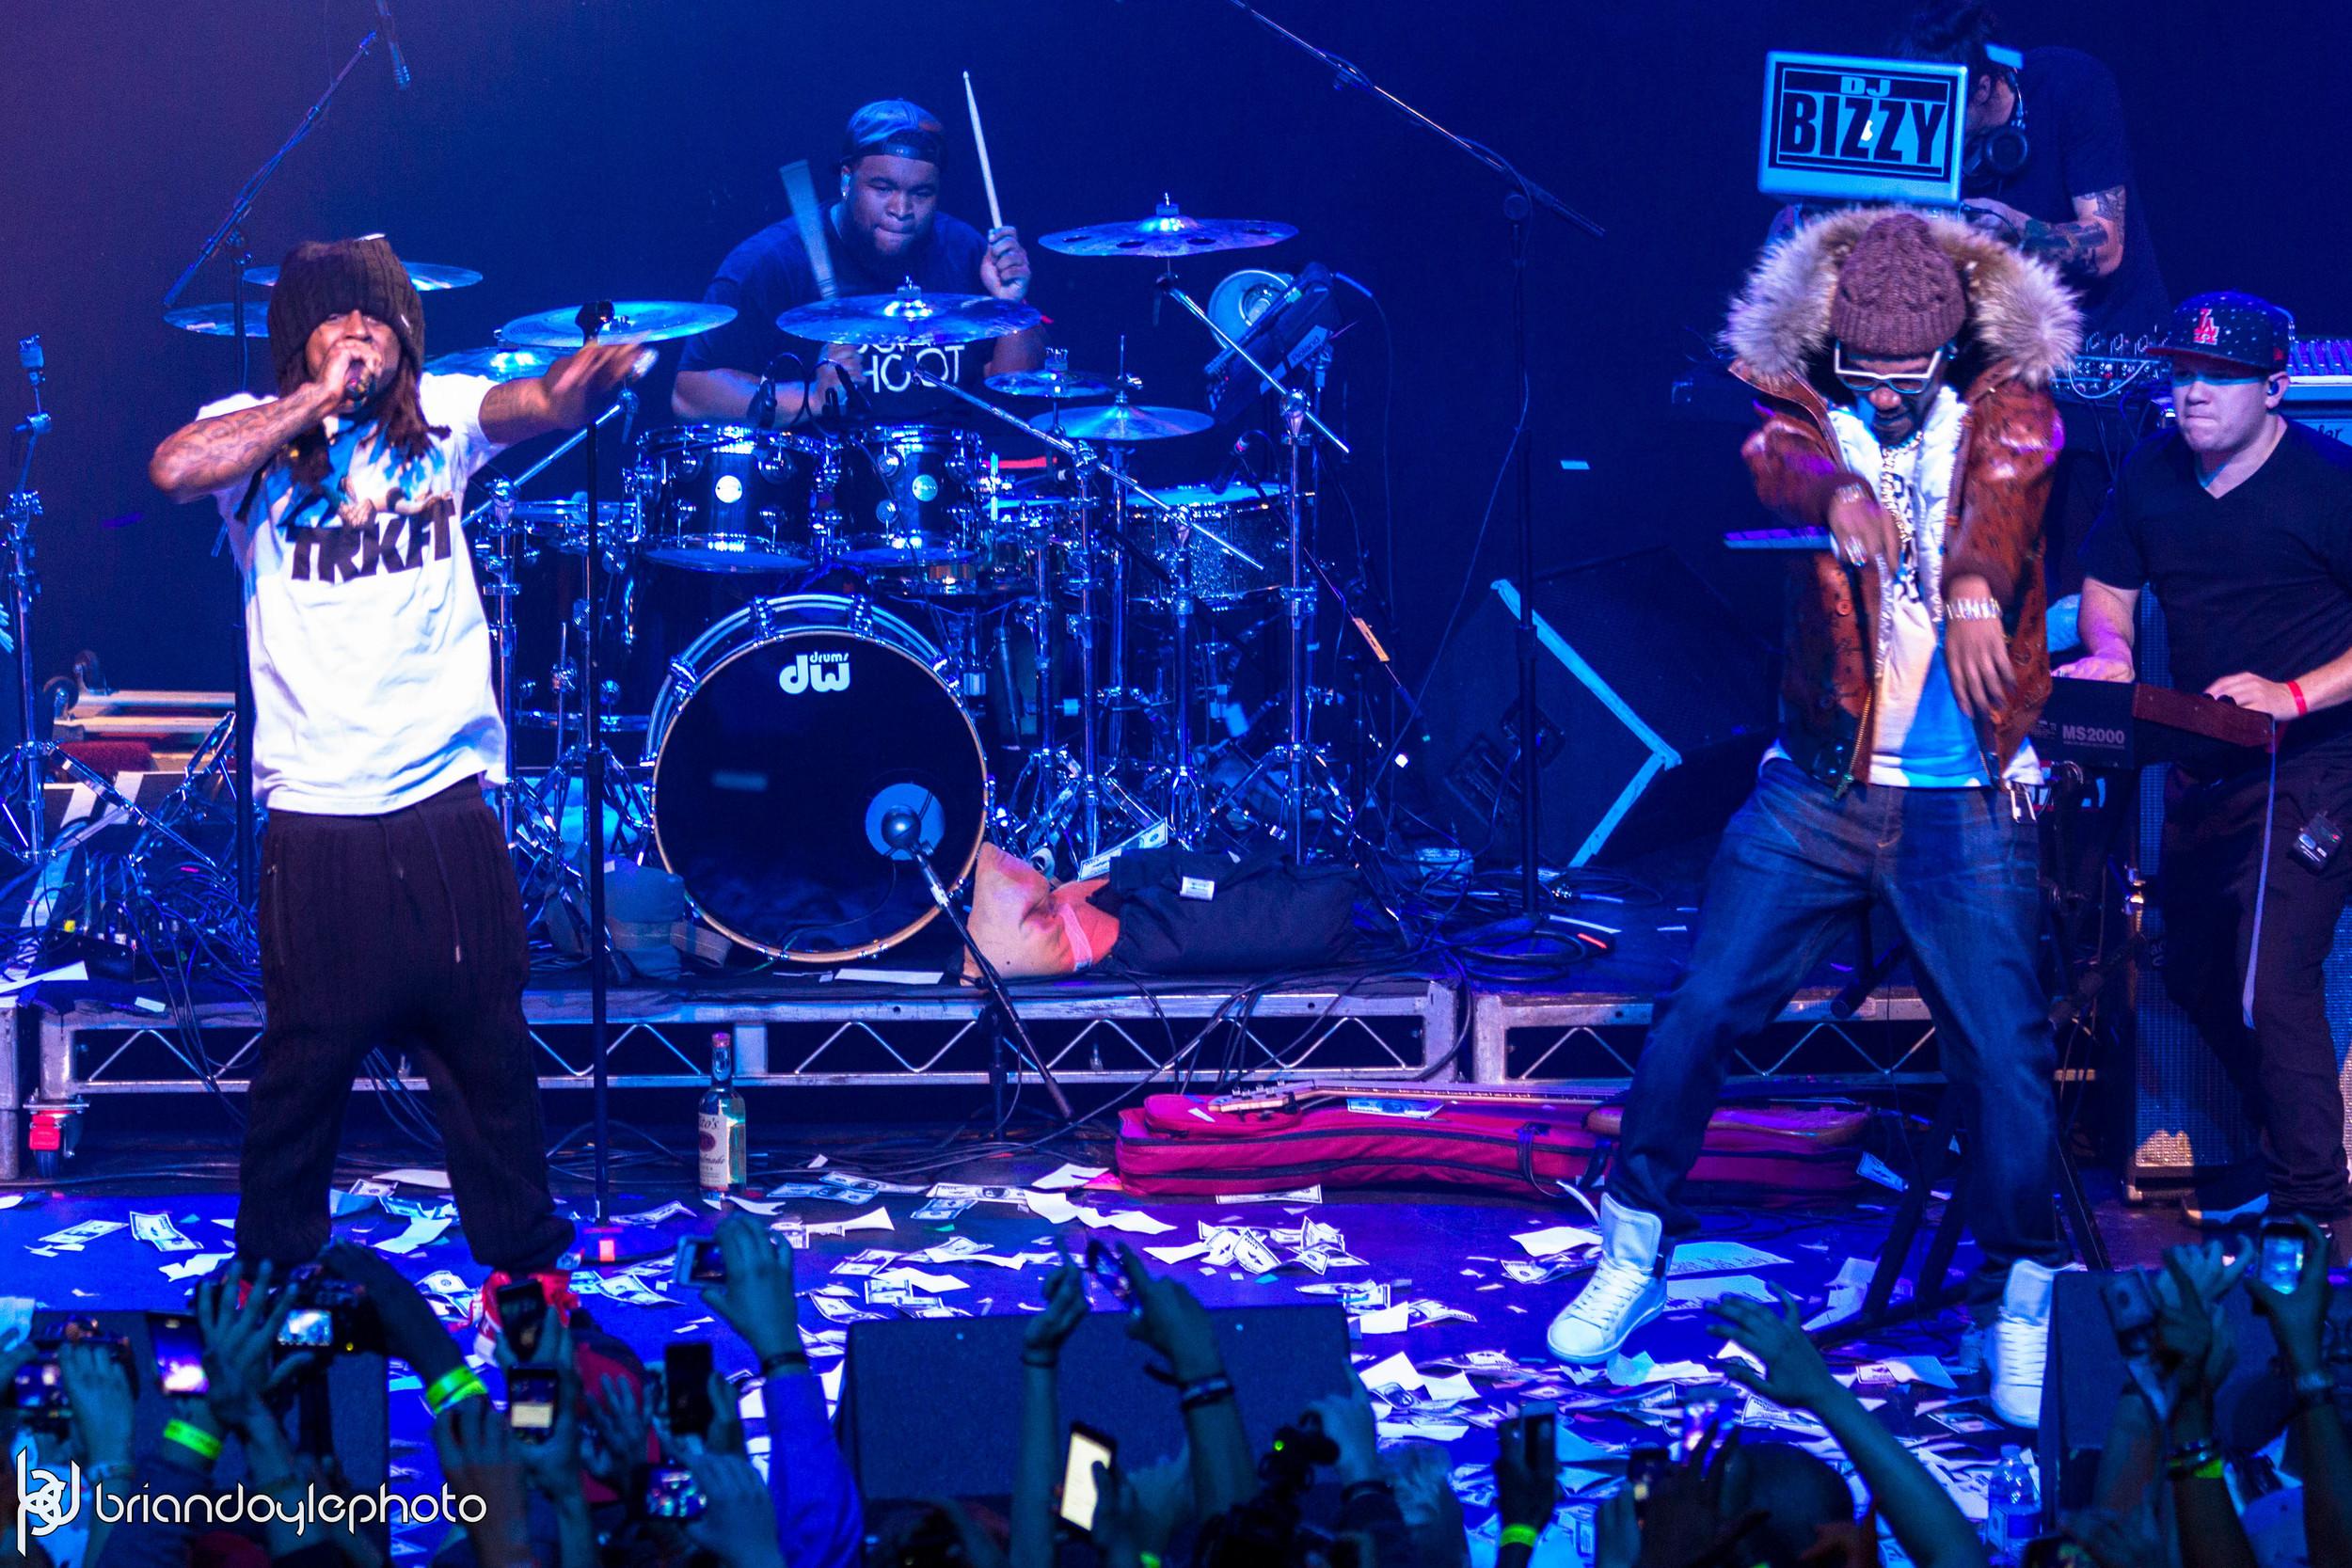 Lil Wayne, Juicy J, Two-9, Tree @ The Fonda 25.11.2014-36.jpg